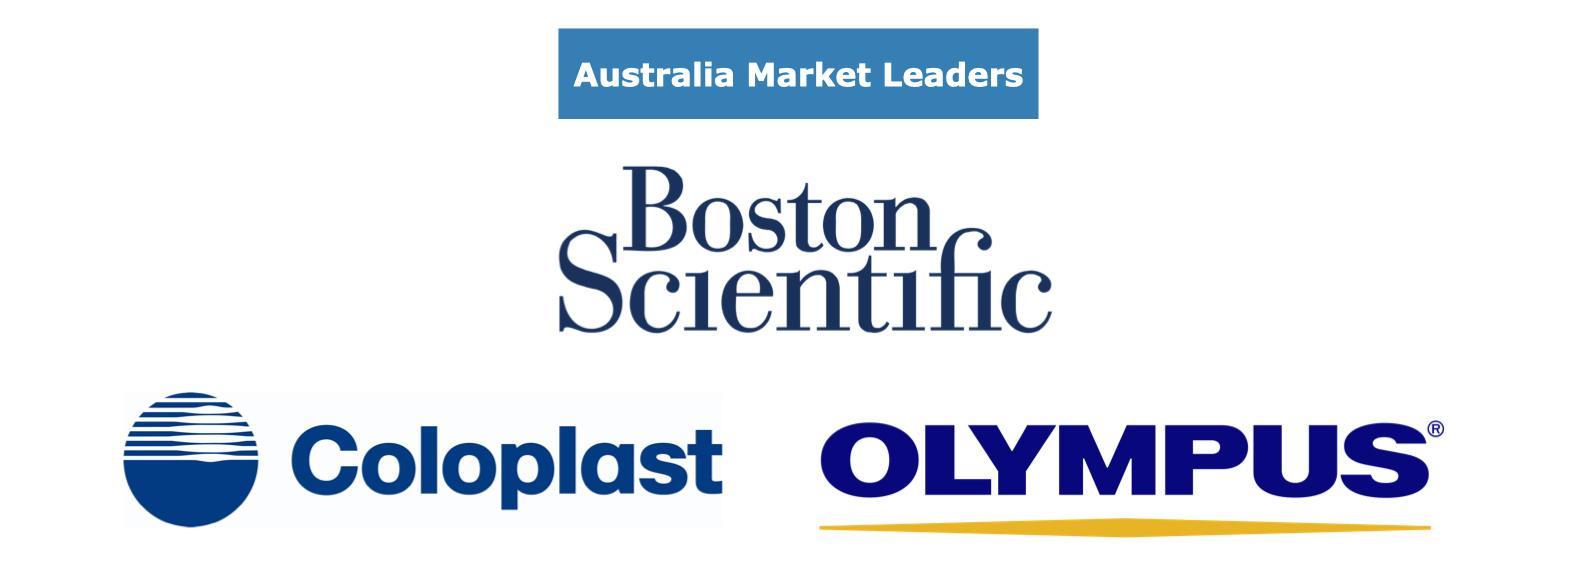 Australia Urology Market Leaders